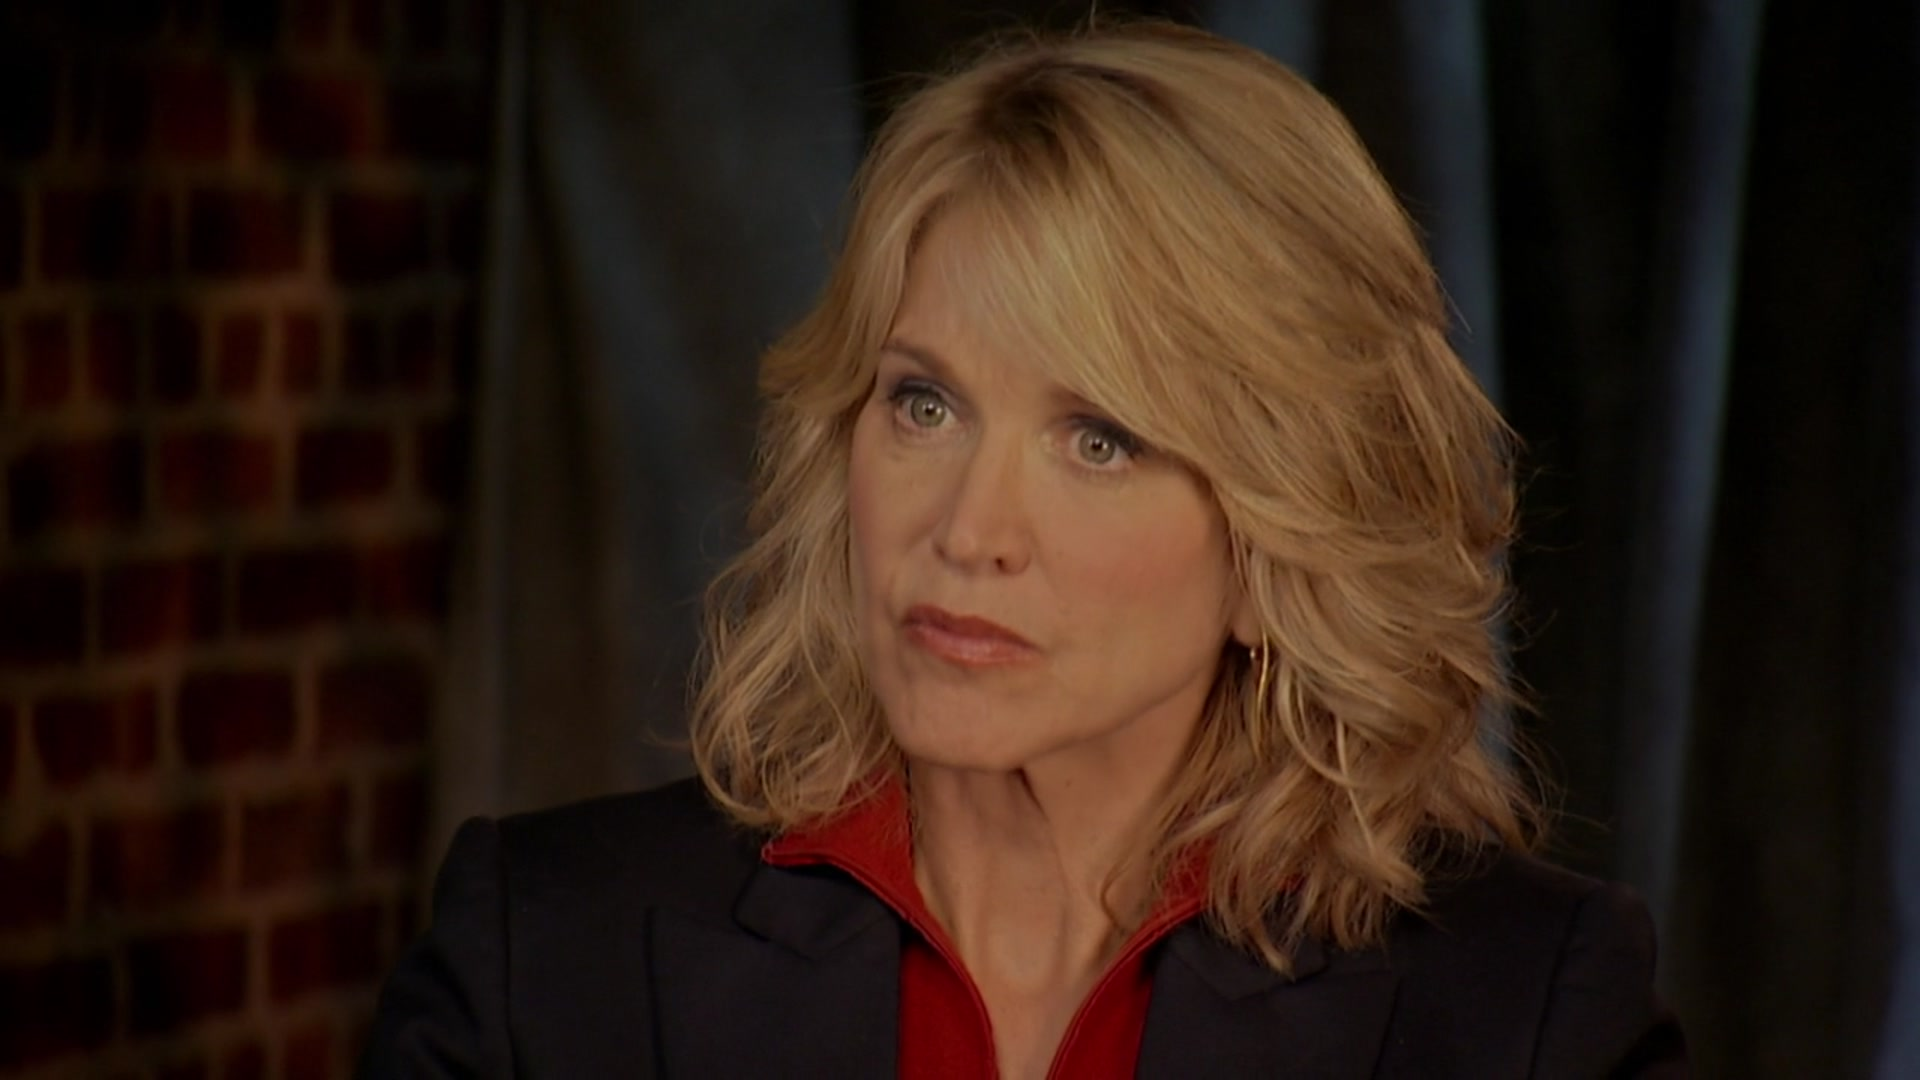 Watch On The Case With Paula Zahn Season 9 Prime Video